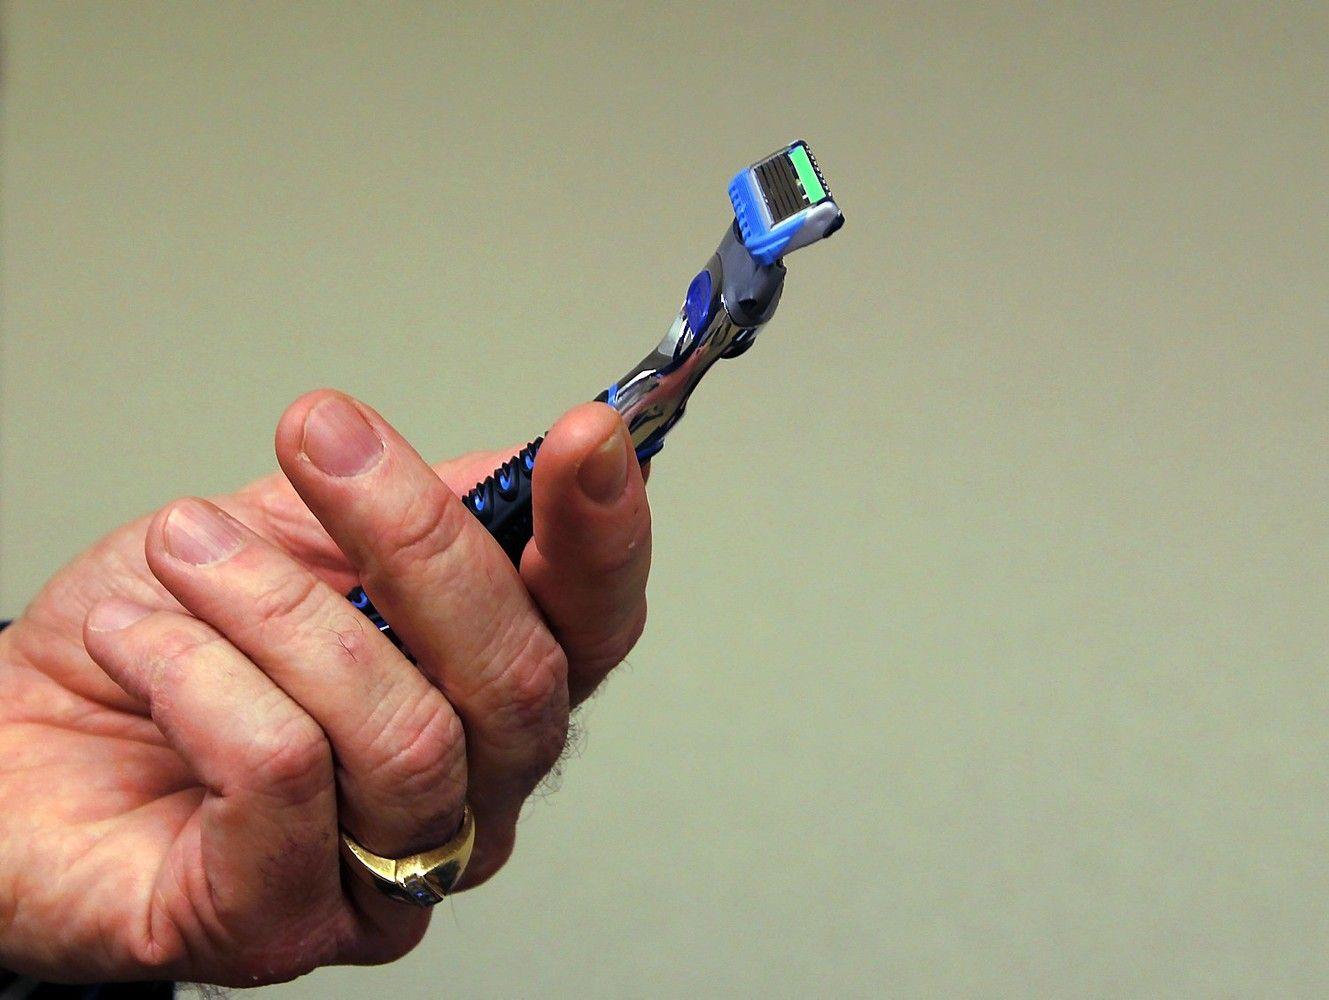 "Ilgametė ""Gillette"" akcija baigėsi nesėkme: peiliukus išsiuntė ne ten"